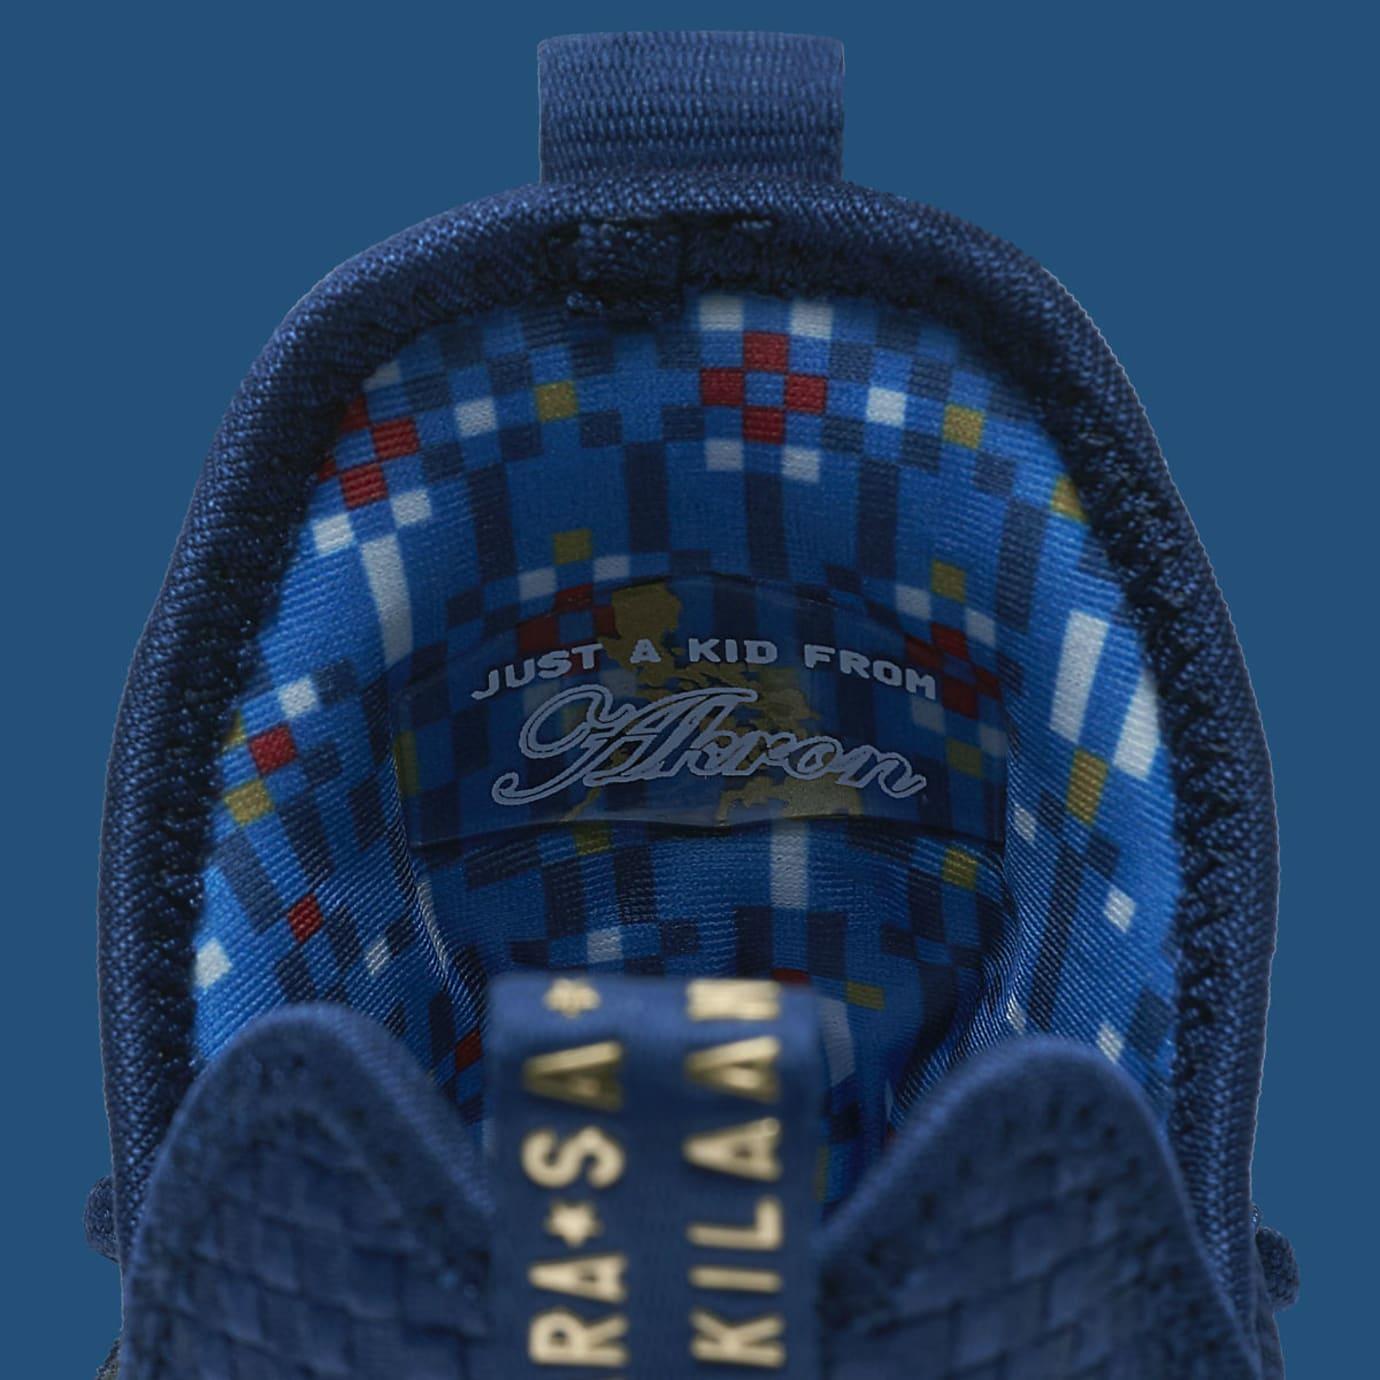 Nike LeBron 14 Agimat U.S. Release Date Tongue Back 852402-400